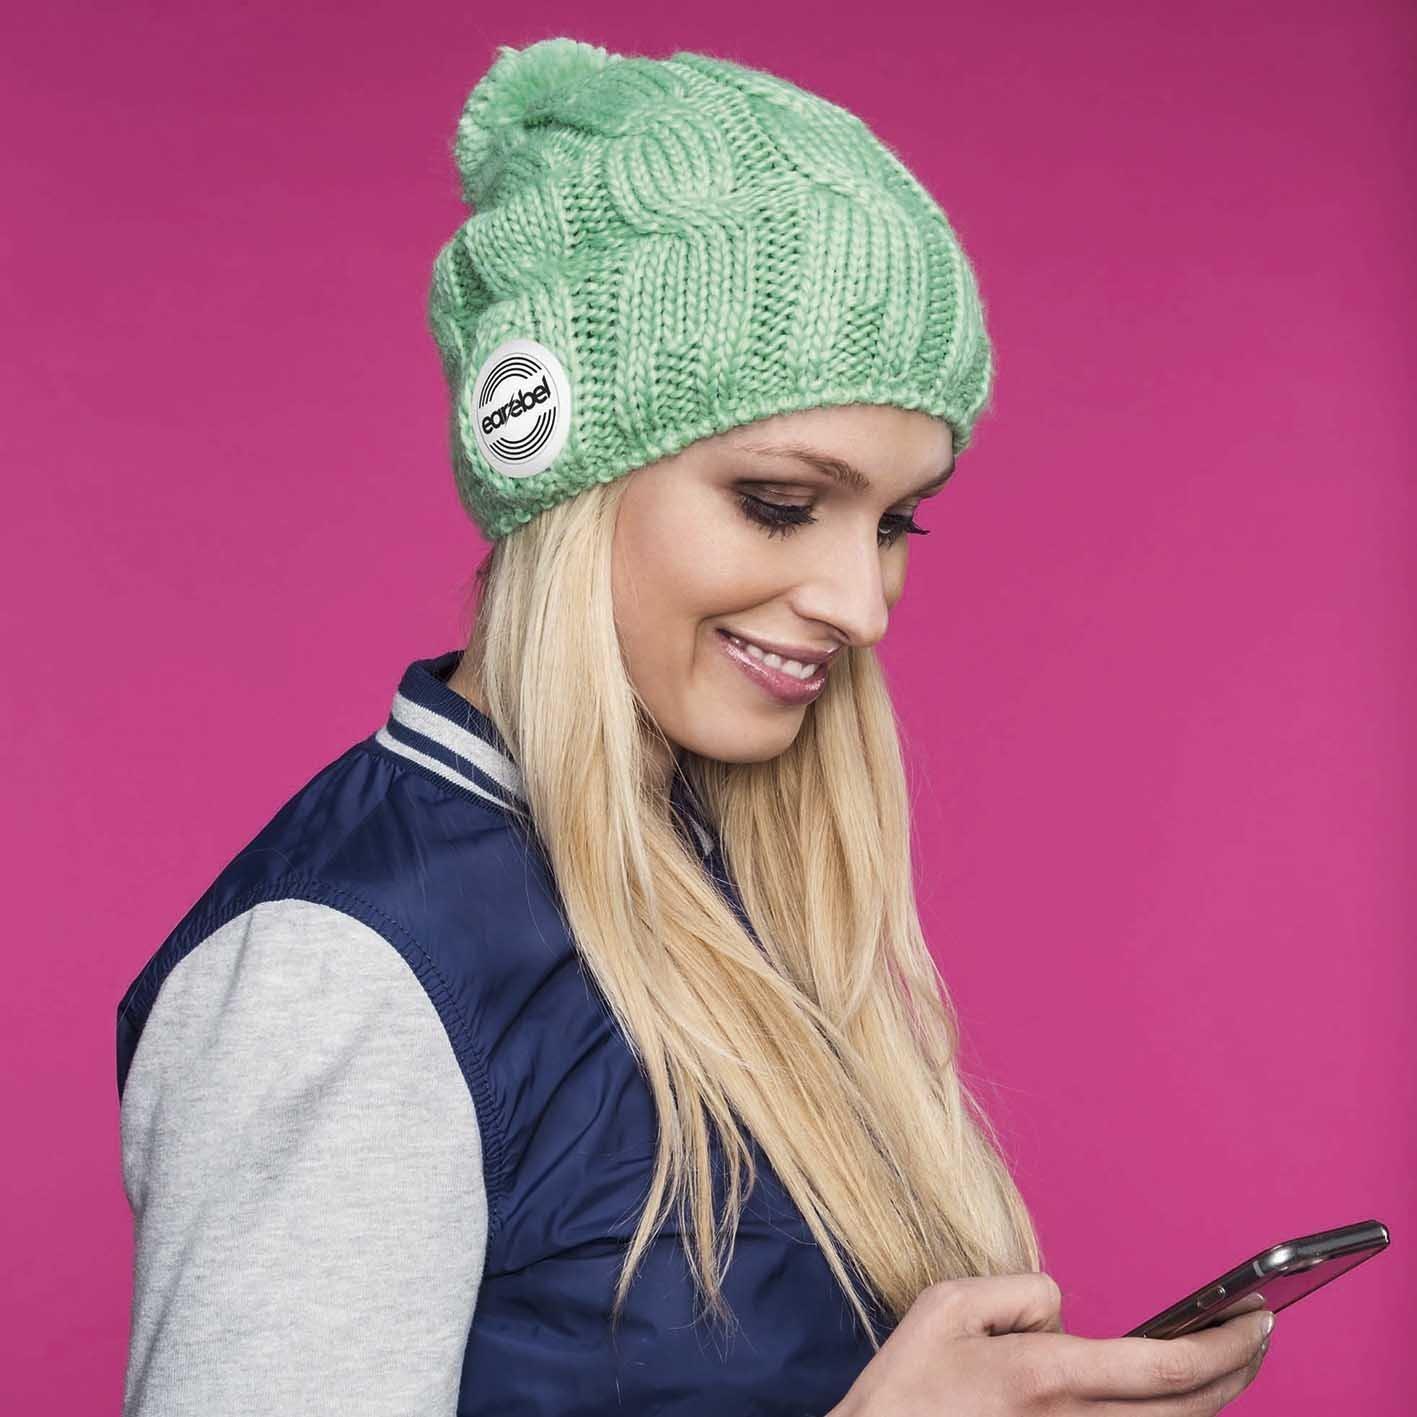 earebel Bluetooth Strickmütze Beanie Lifestyle Trenza Jufrako mit Kopfhörer grün